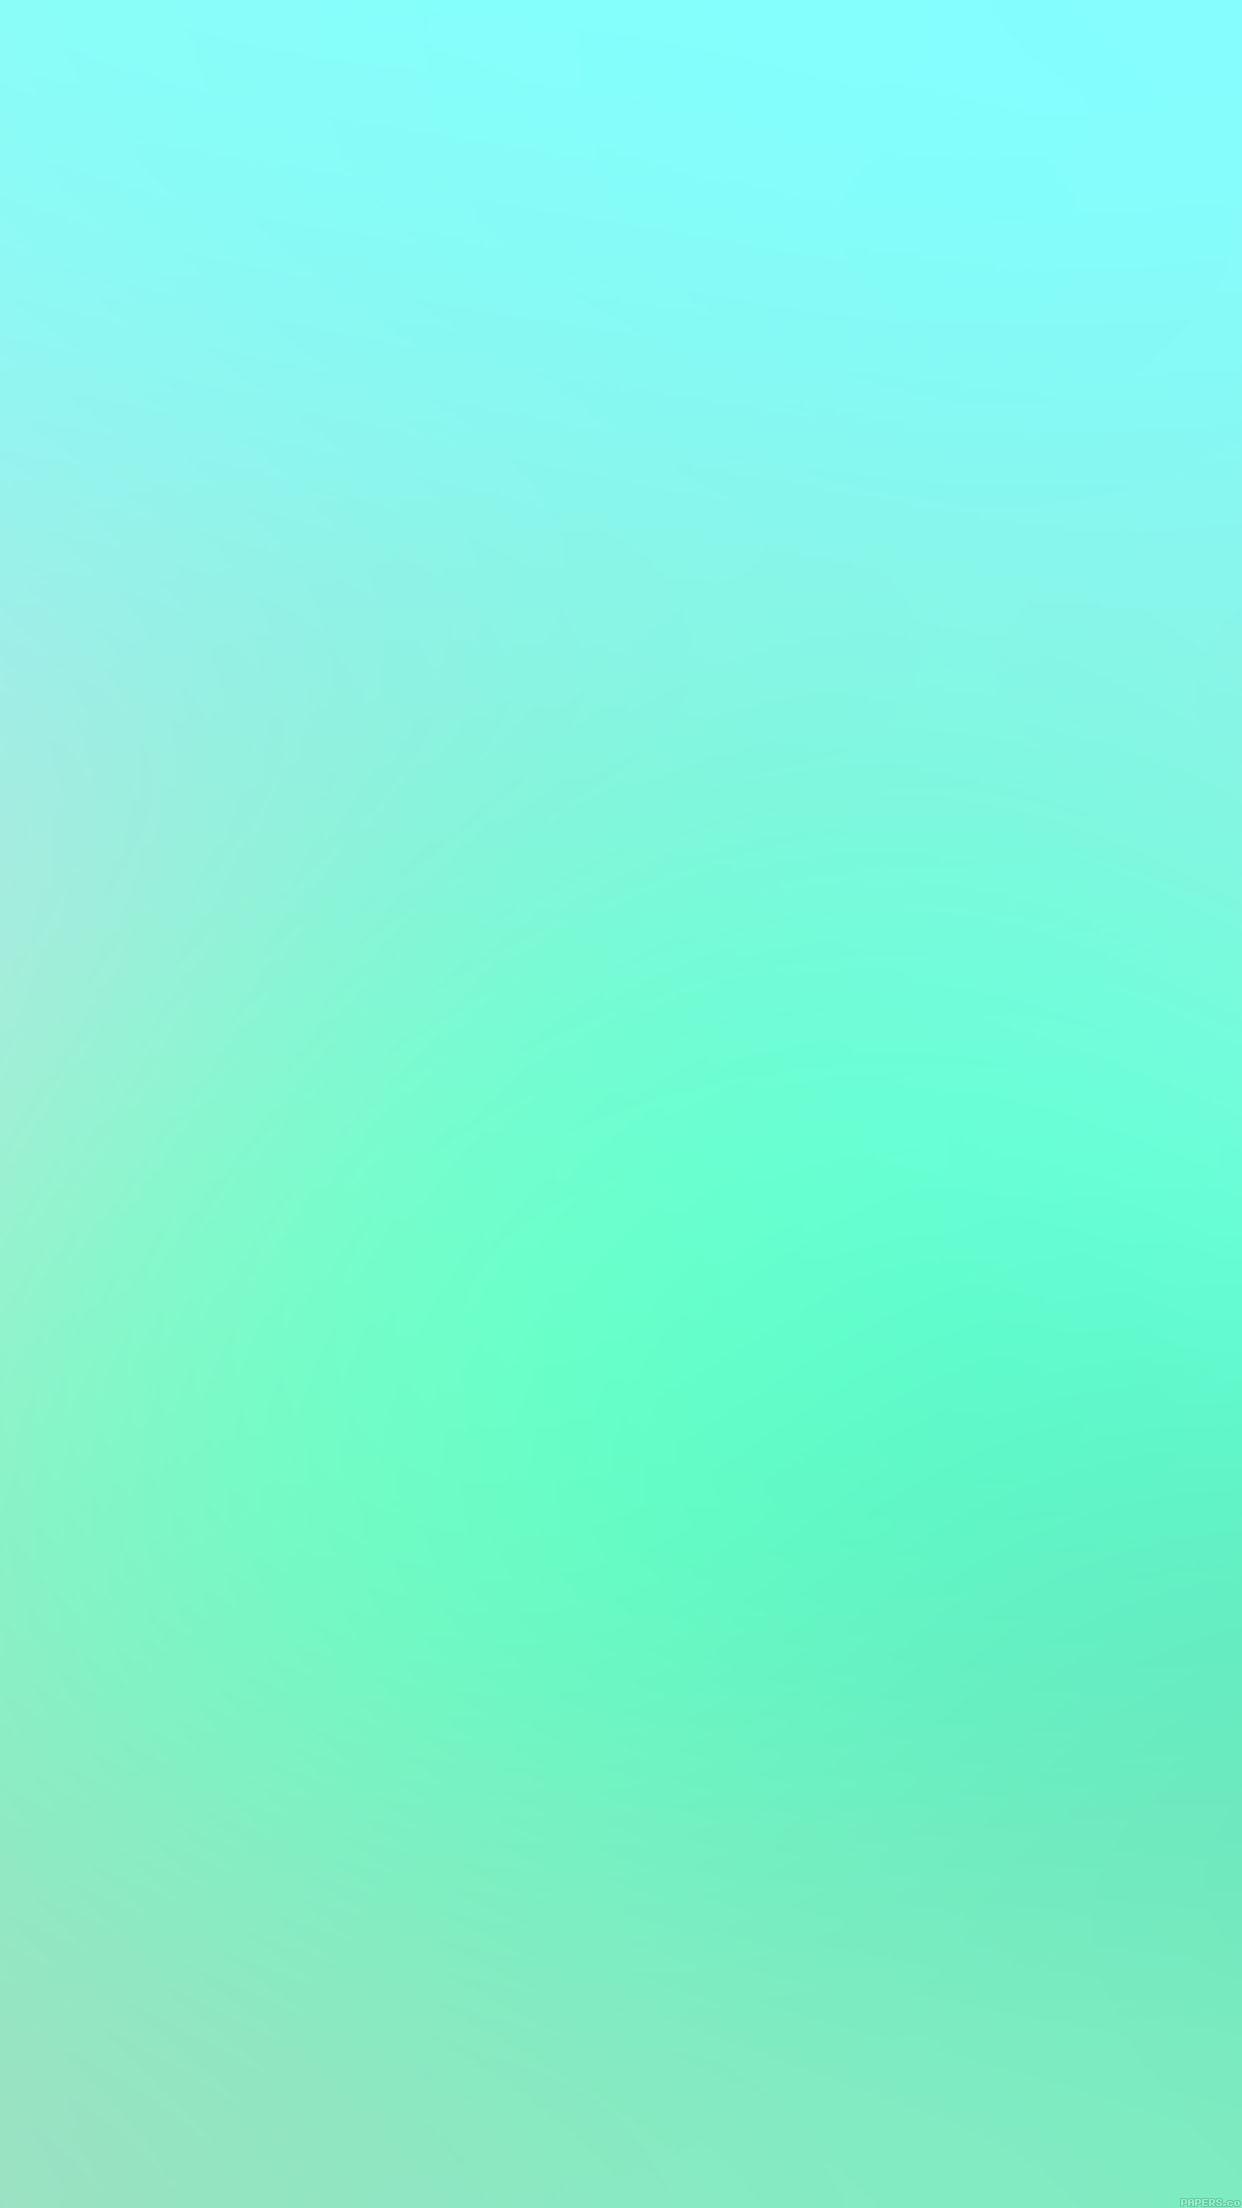 Pink Car Wallpaper Sb39 Wallpaper Green Blue Pastel Blur Papers Co